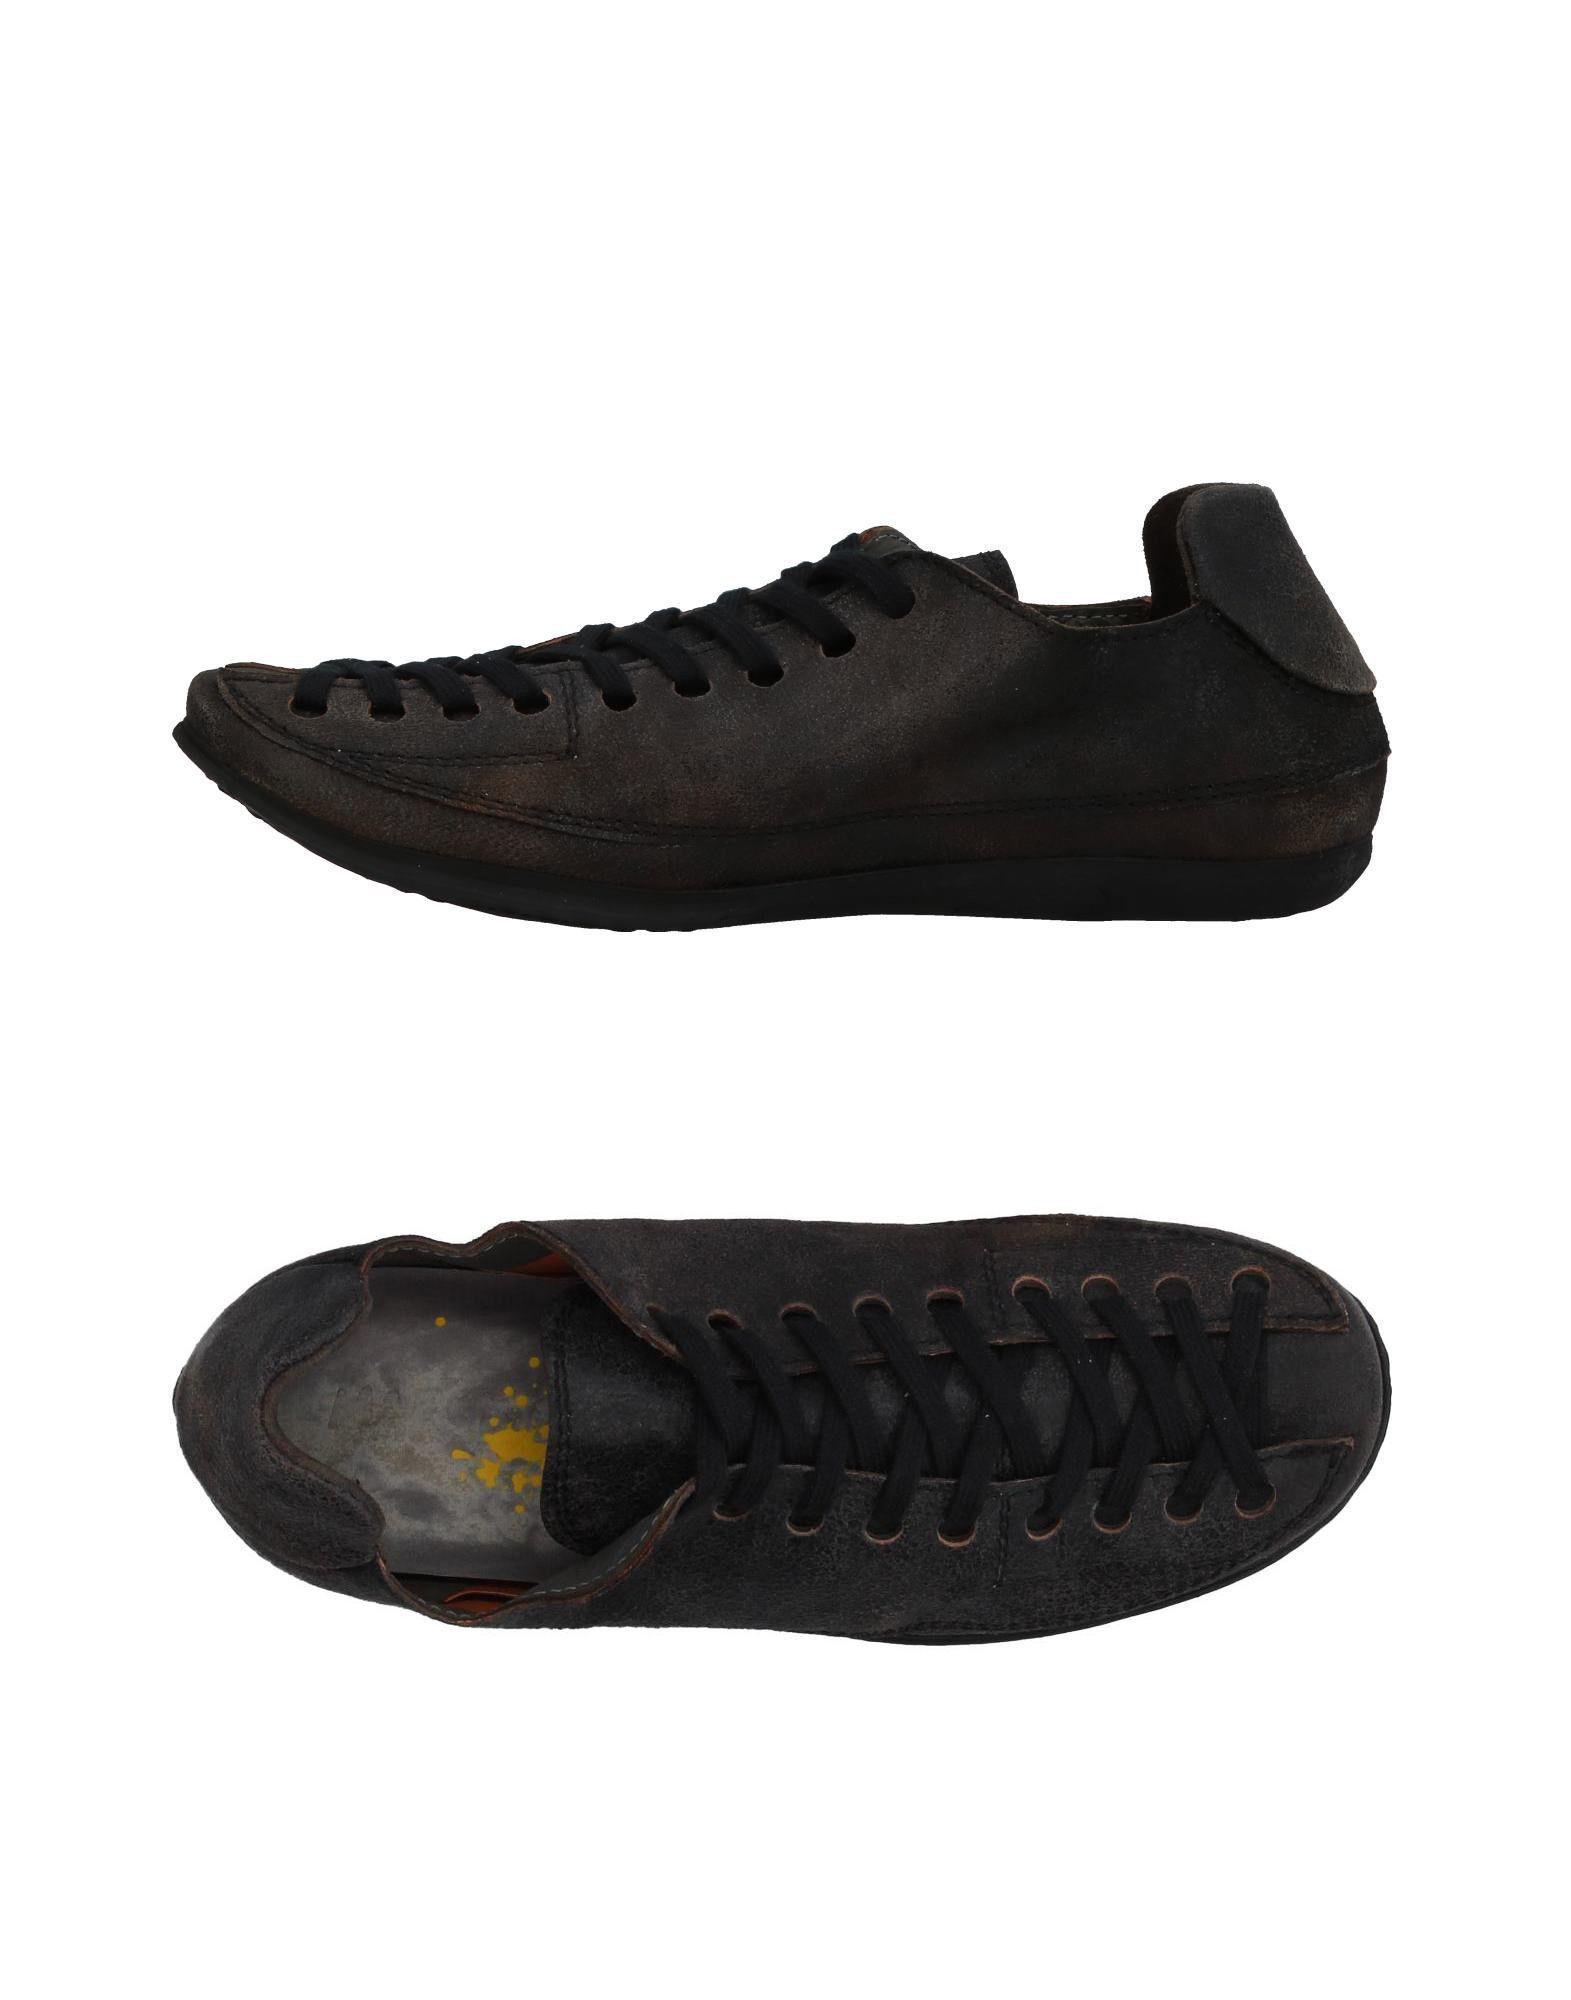 Marsèll Bas-tops Et Chaussures De Sport rVnOiBTAes